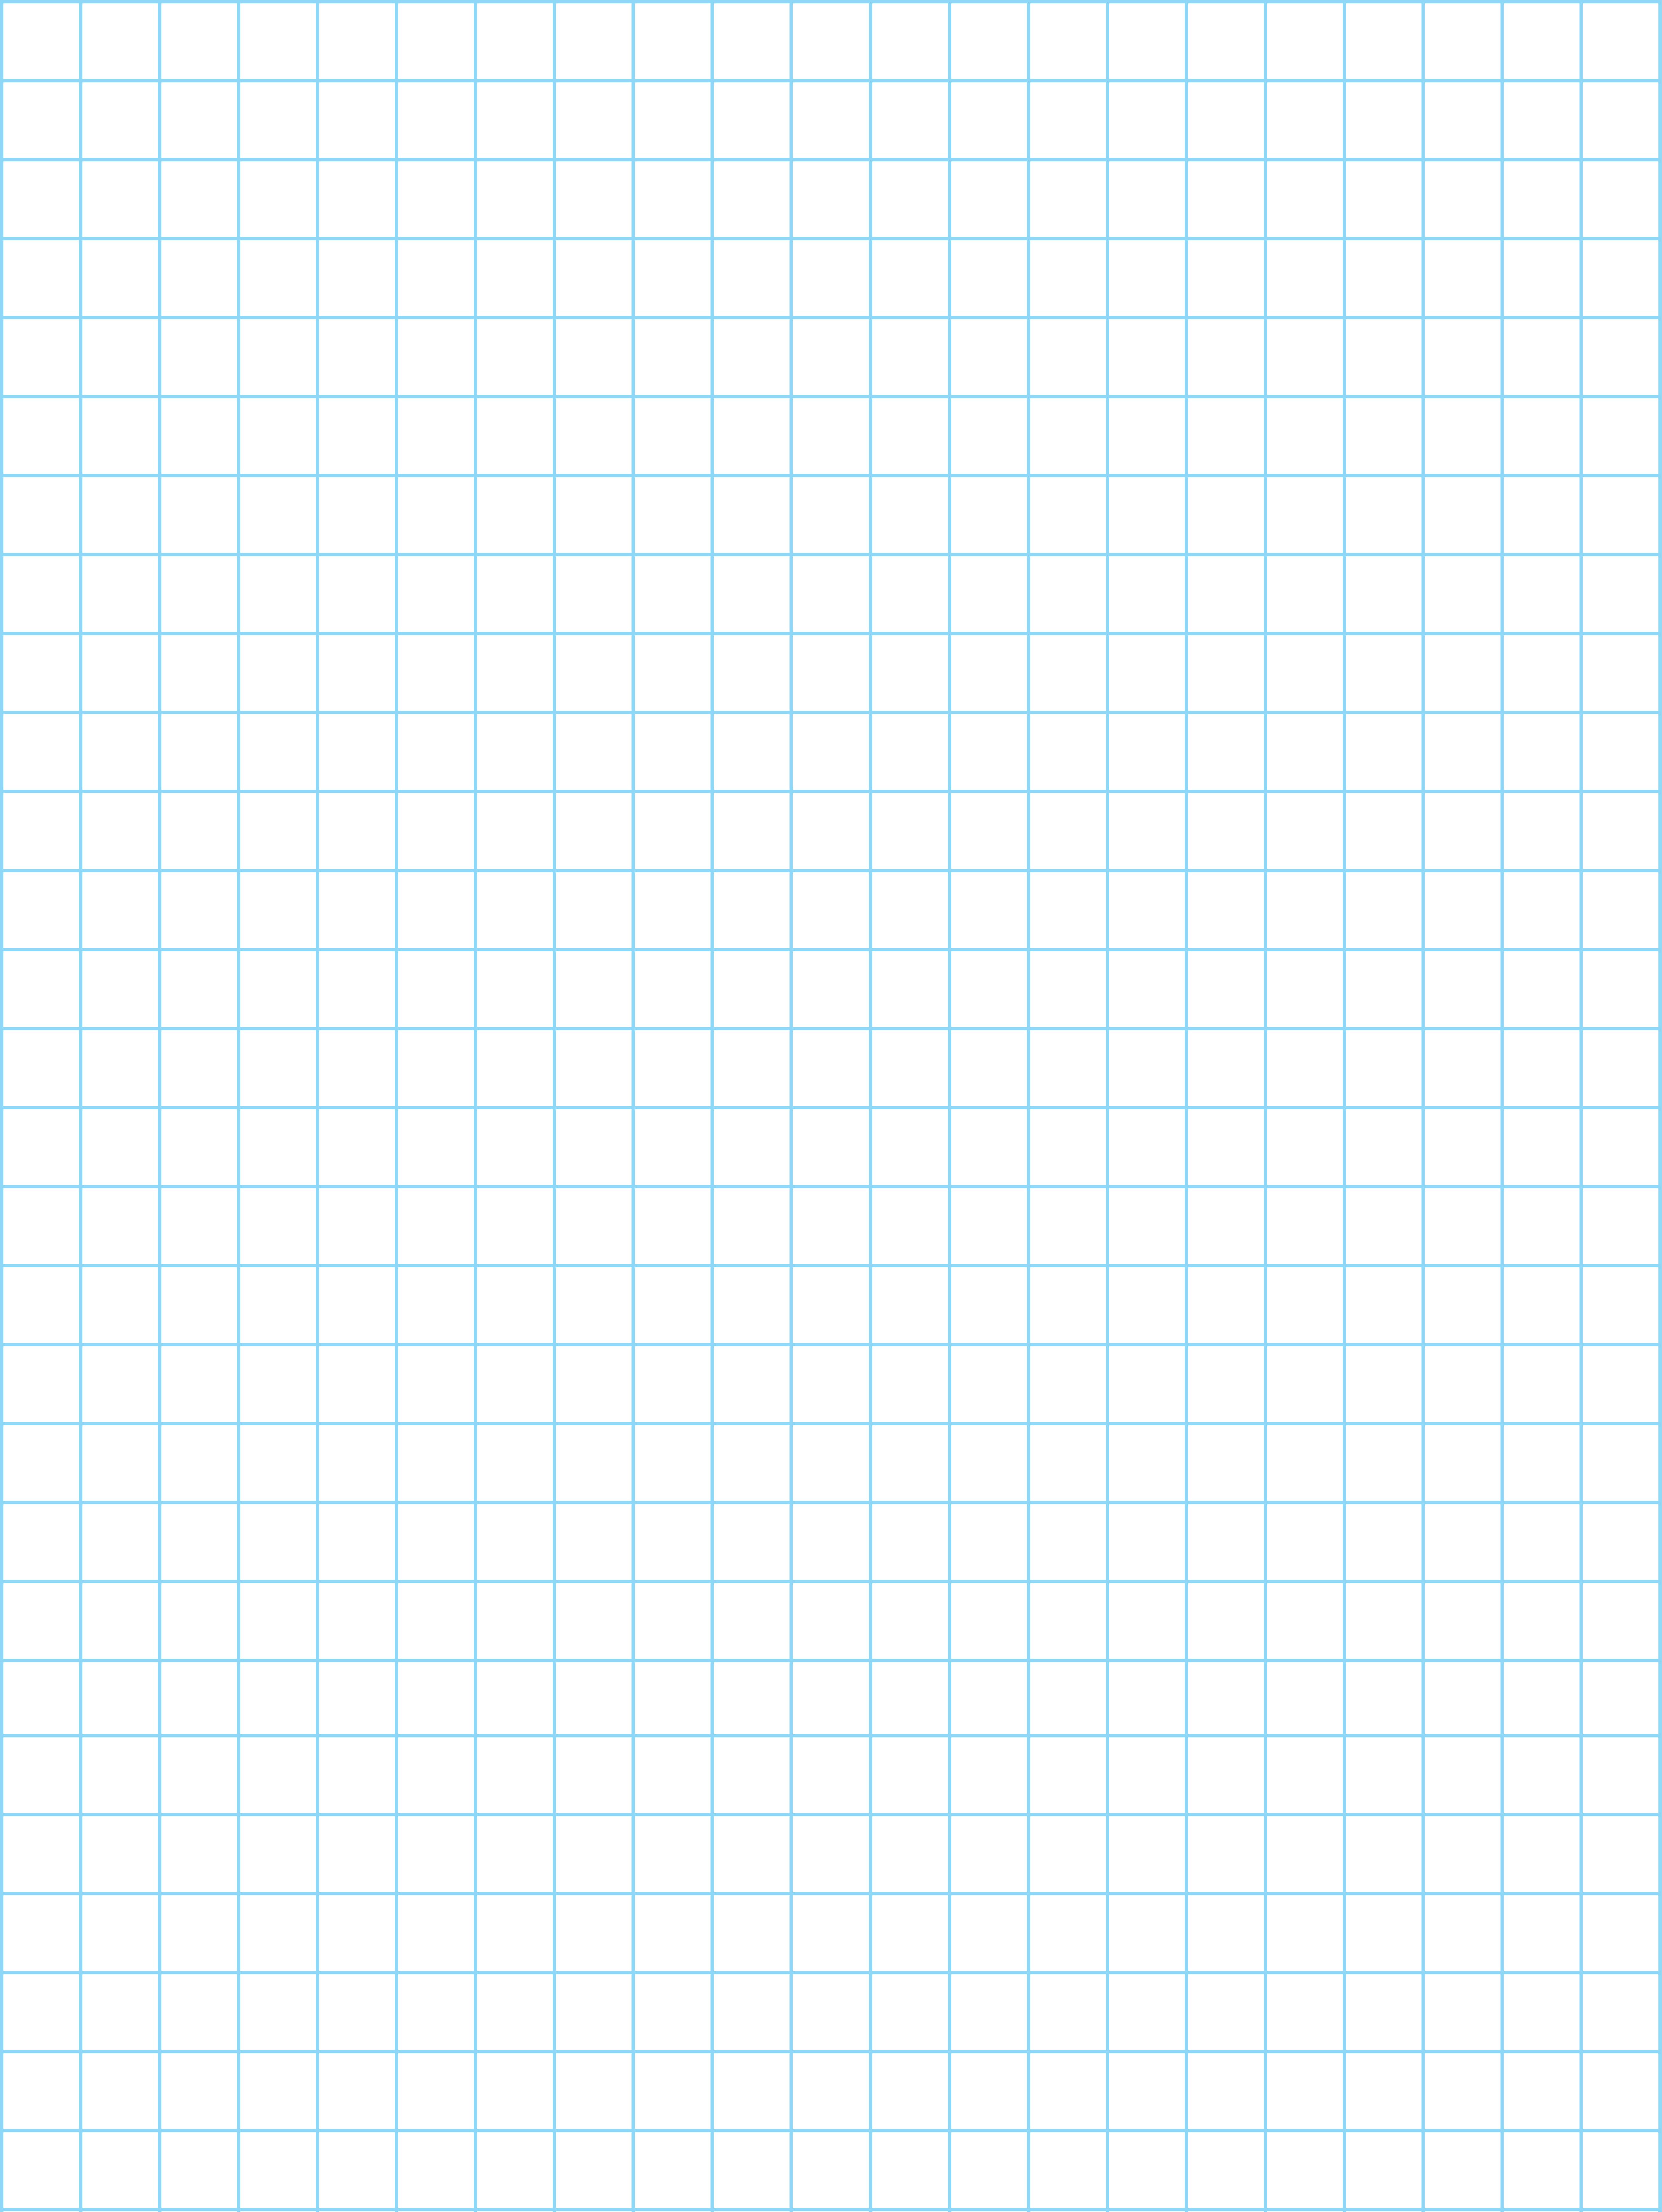 Notebook clipart school notebook Notebook School Picture PNG Sheet